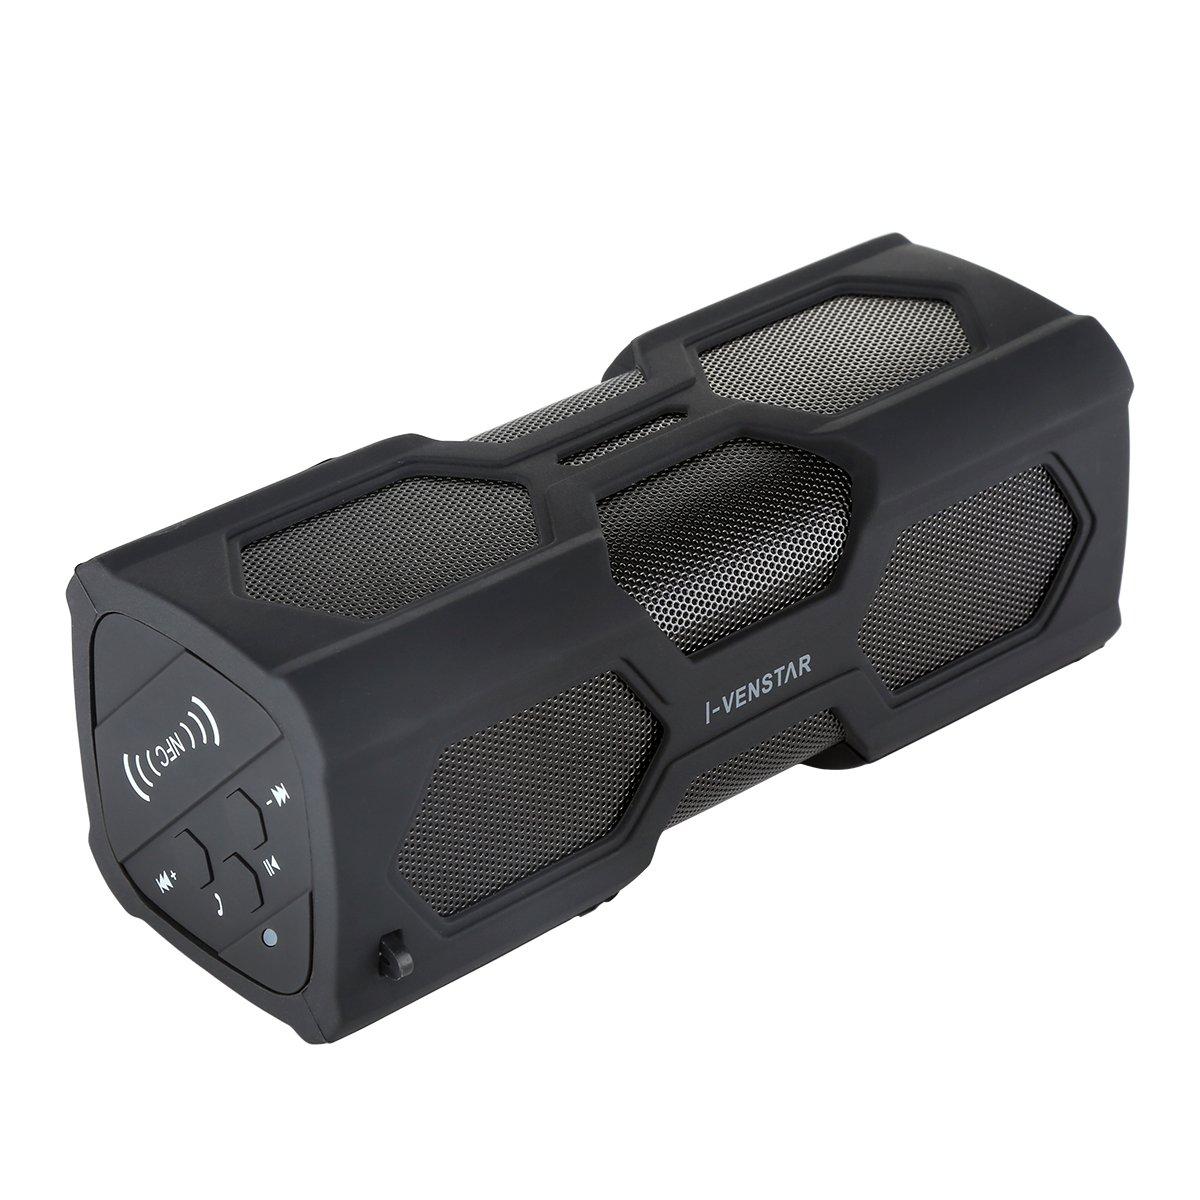 I-Venstar Waterproof Bluetooth Speaker, 4400mah Battery, Portable Wireless Dustproof Anti-scratch Shockproof Subwoofer Bass Sound Sport Speaker with 2x3W / CSR Chipset  ..